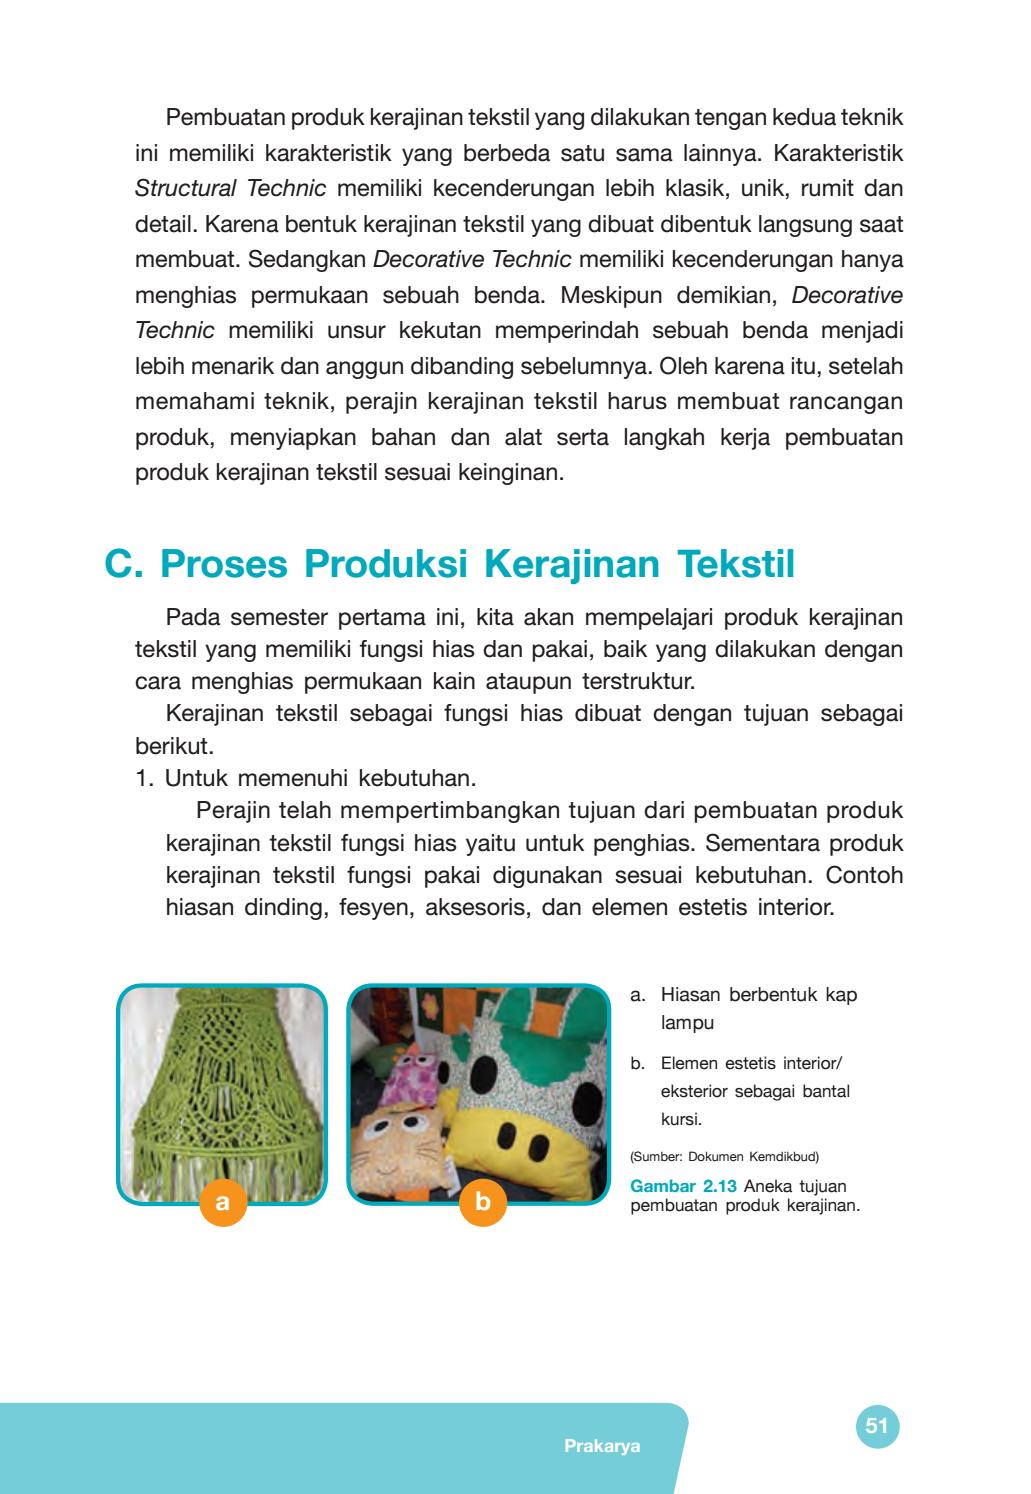 Proses Pembuatan Kerajinan Tekstil : proses, pembuatan, kerajinan, tekstil, Kelas, Prakarya, Siswa, Issuu